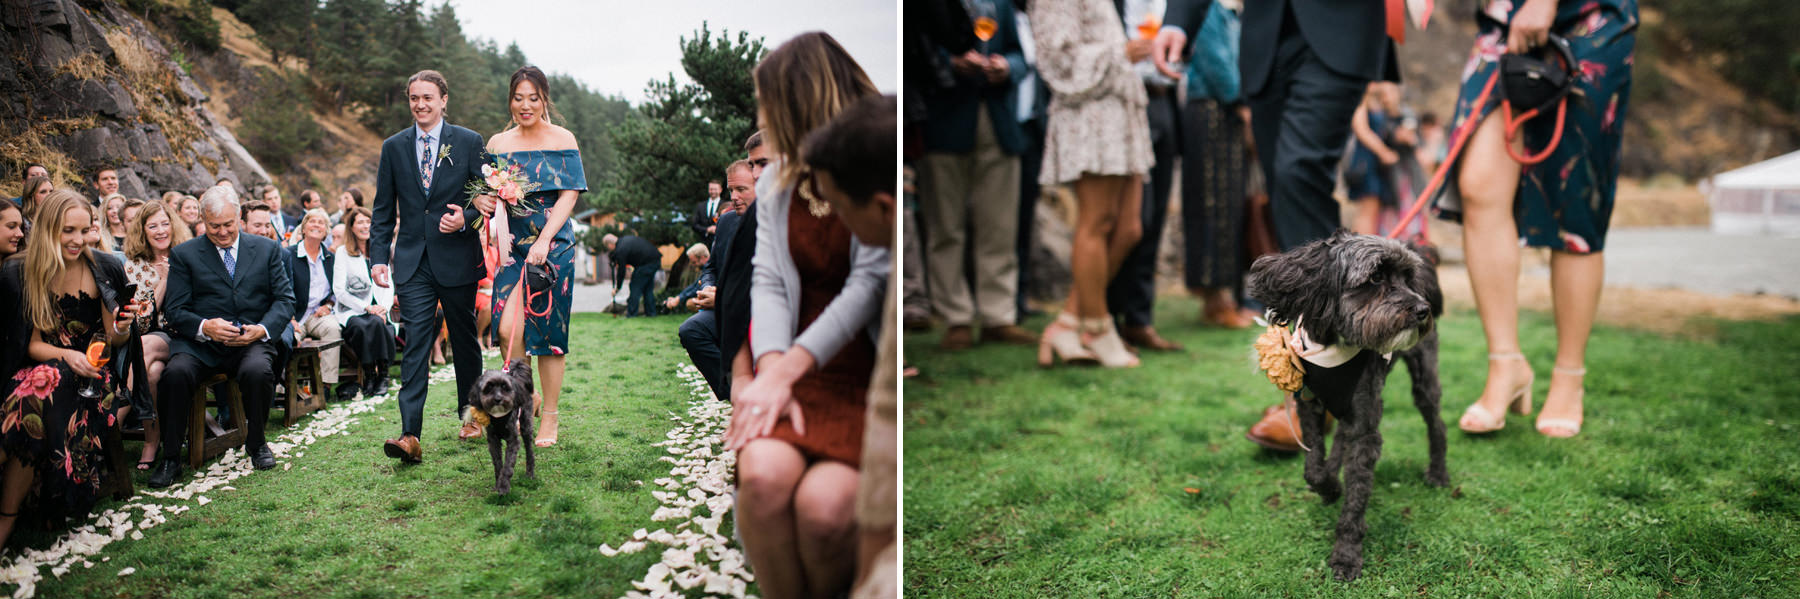 310-colorful-outdoor-lopez-island-wedding.jpg